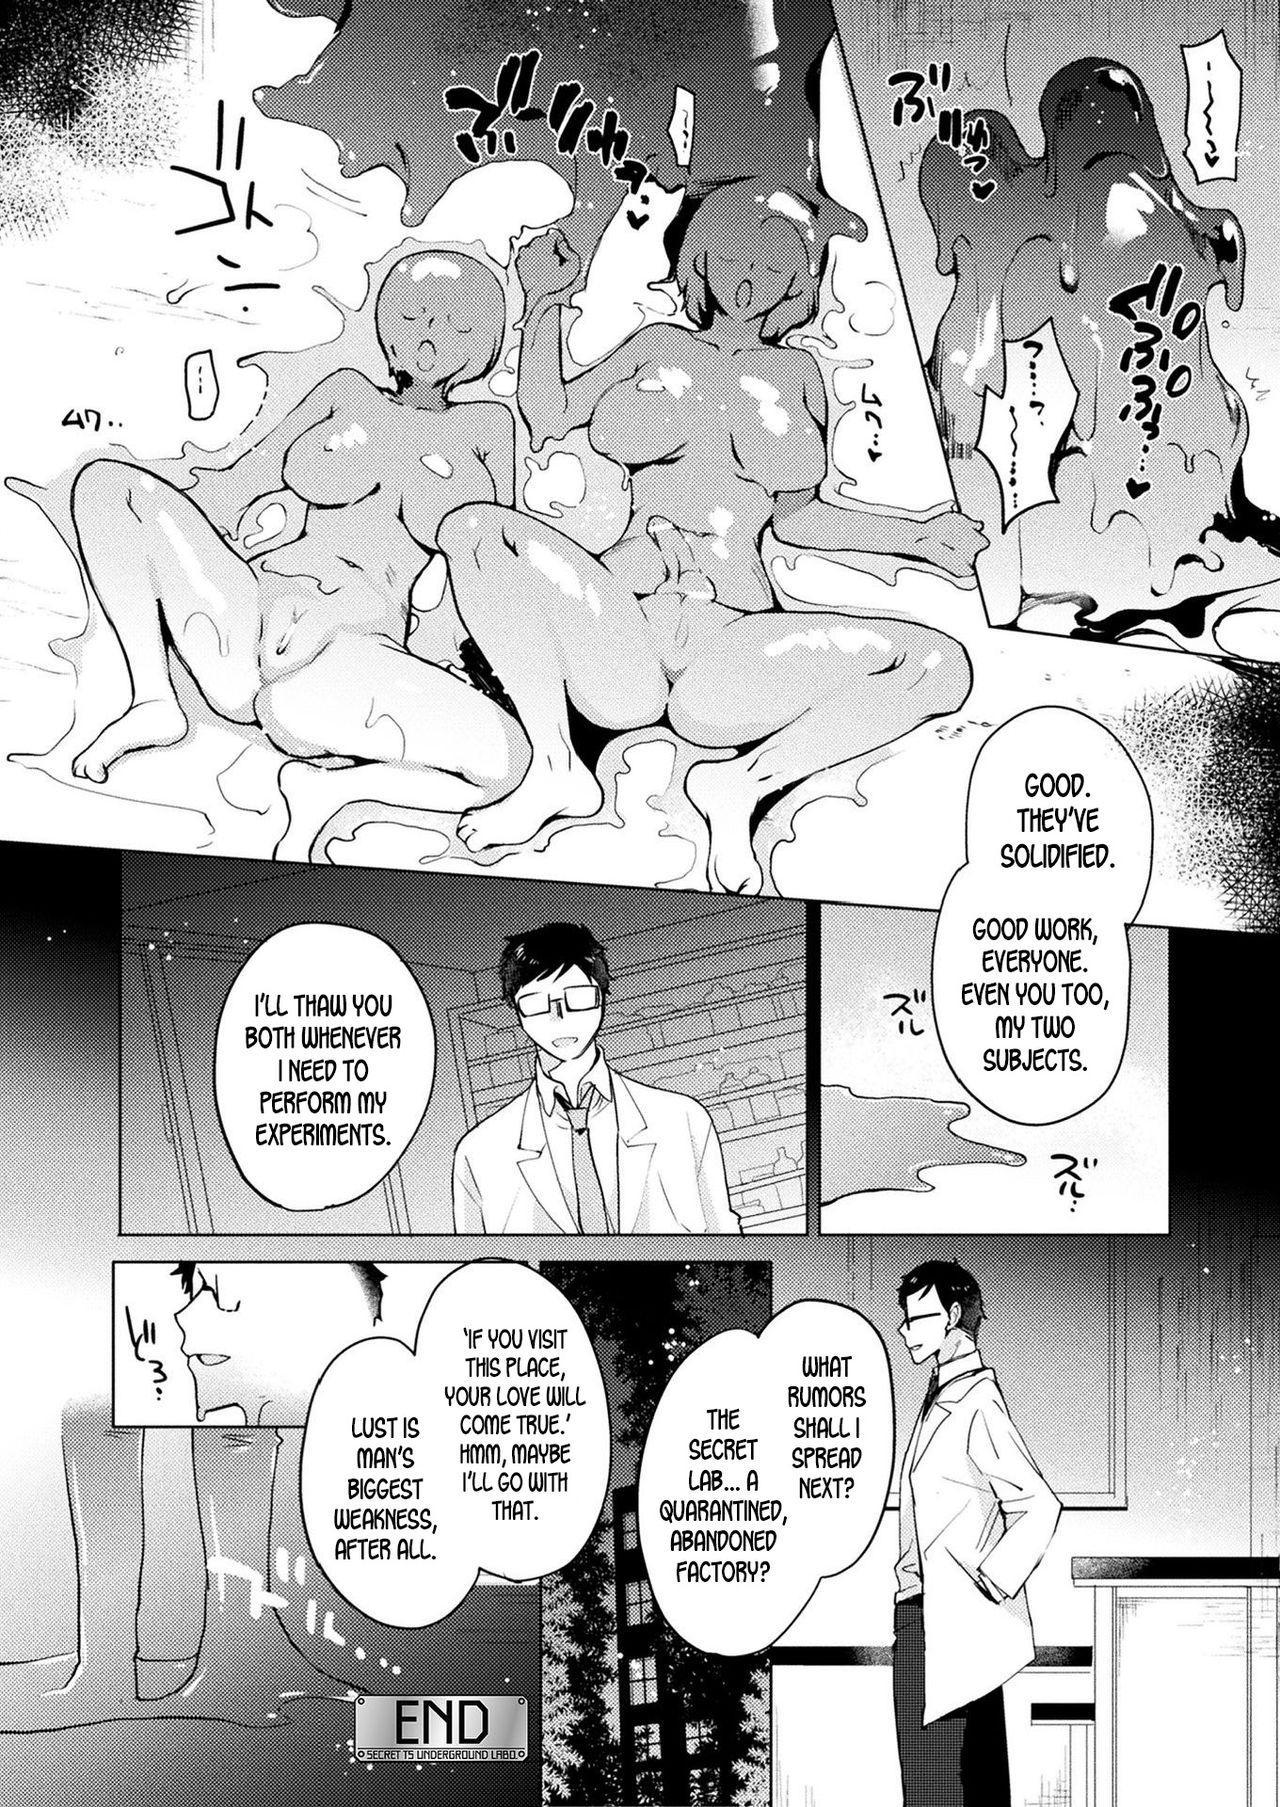 Himitsu no TS Chika Kenkyuujo   Secret TS Underground Lab 17